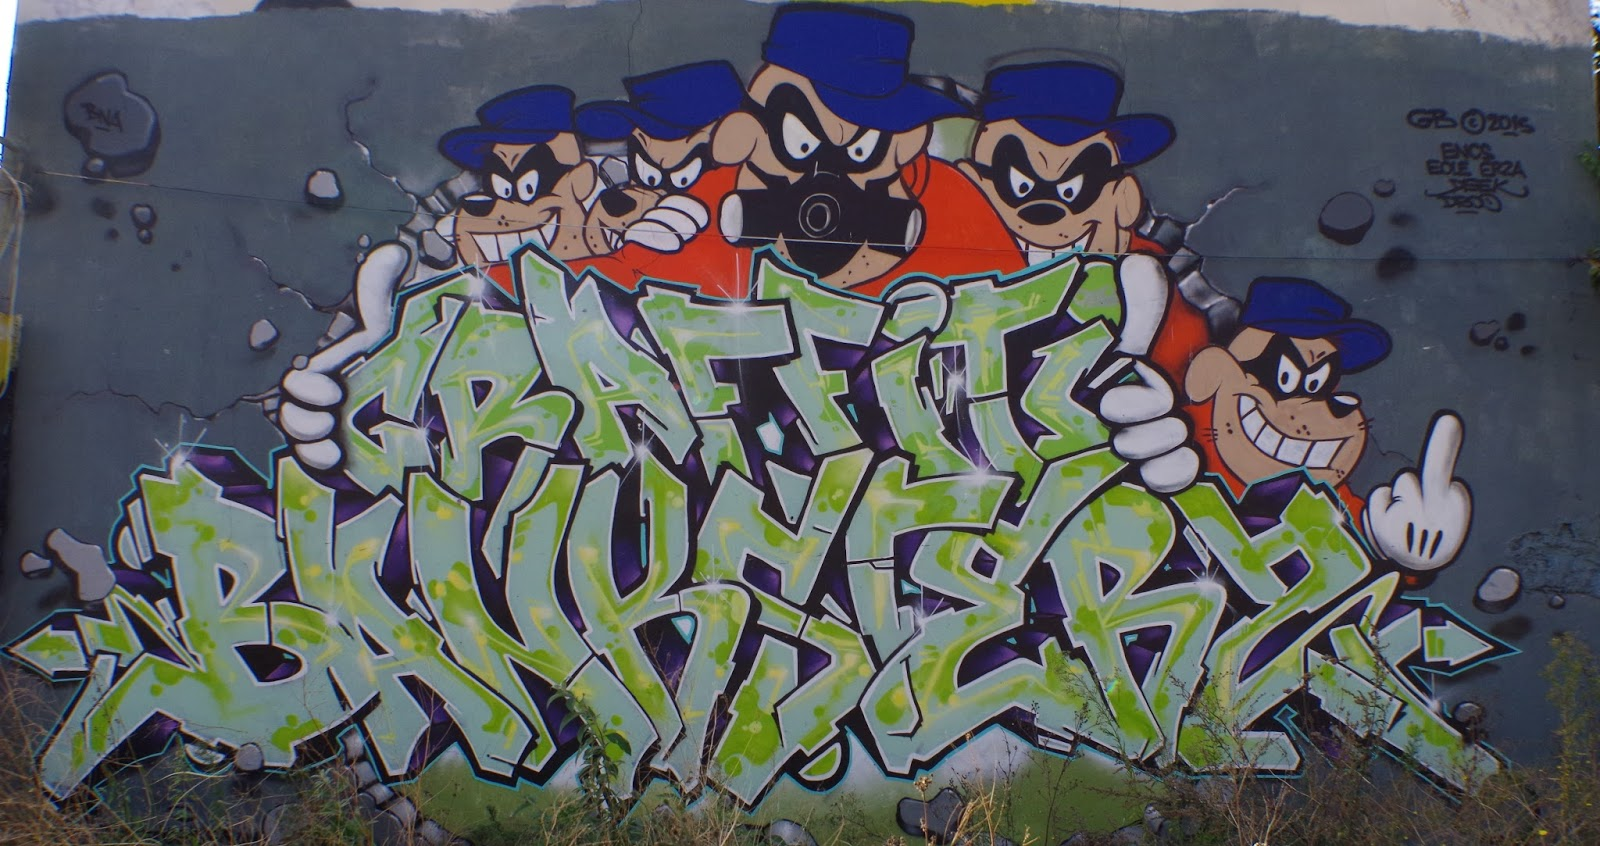 Graffiti Animation Graffiti Animation Comics Film Et Pop Culture Qalam La Plume